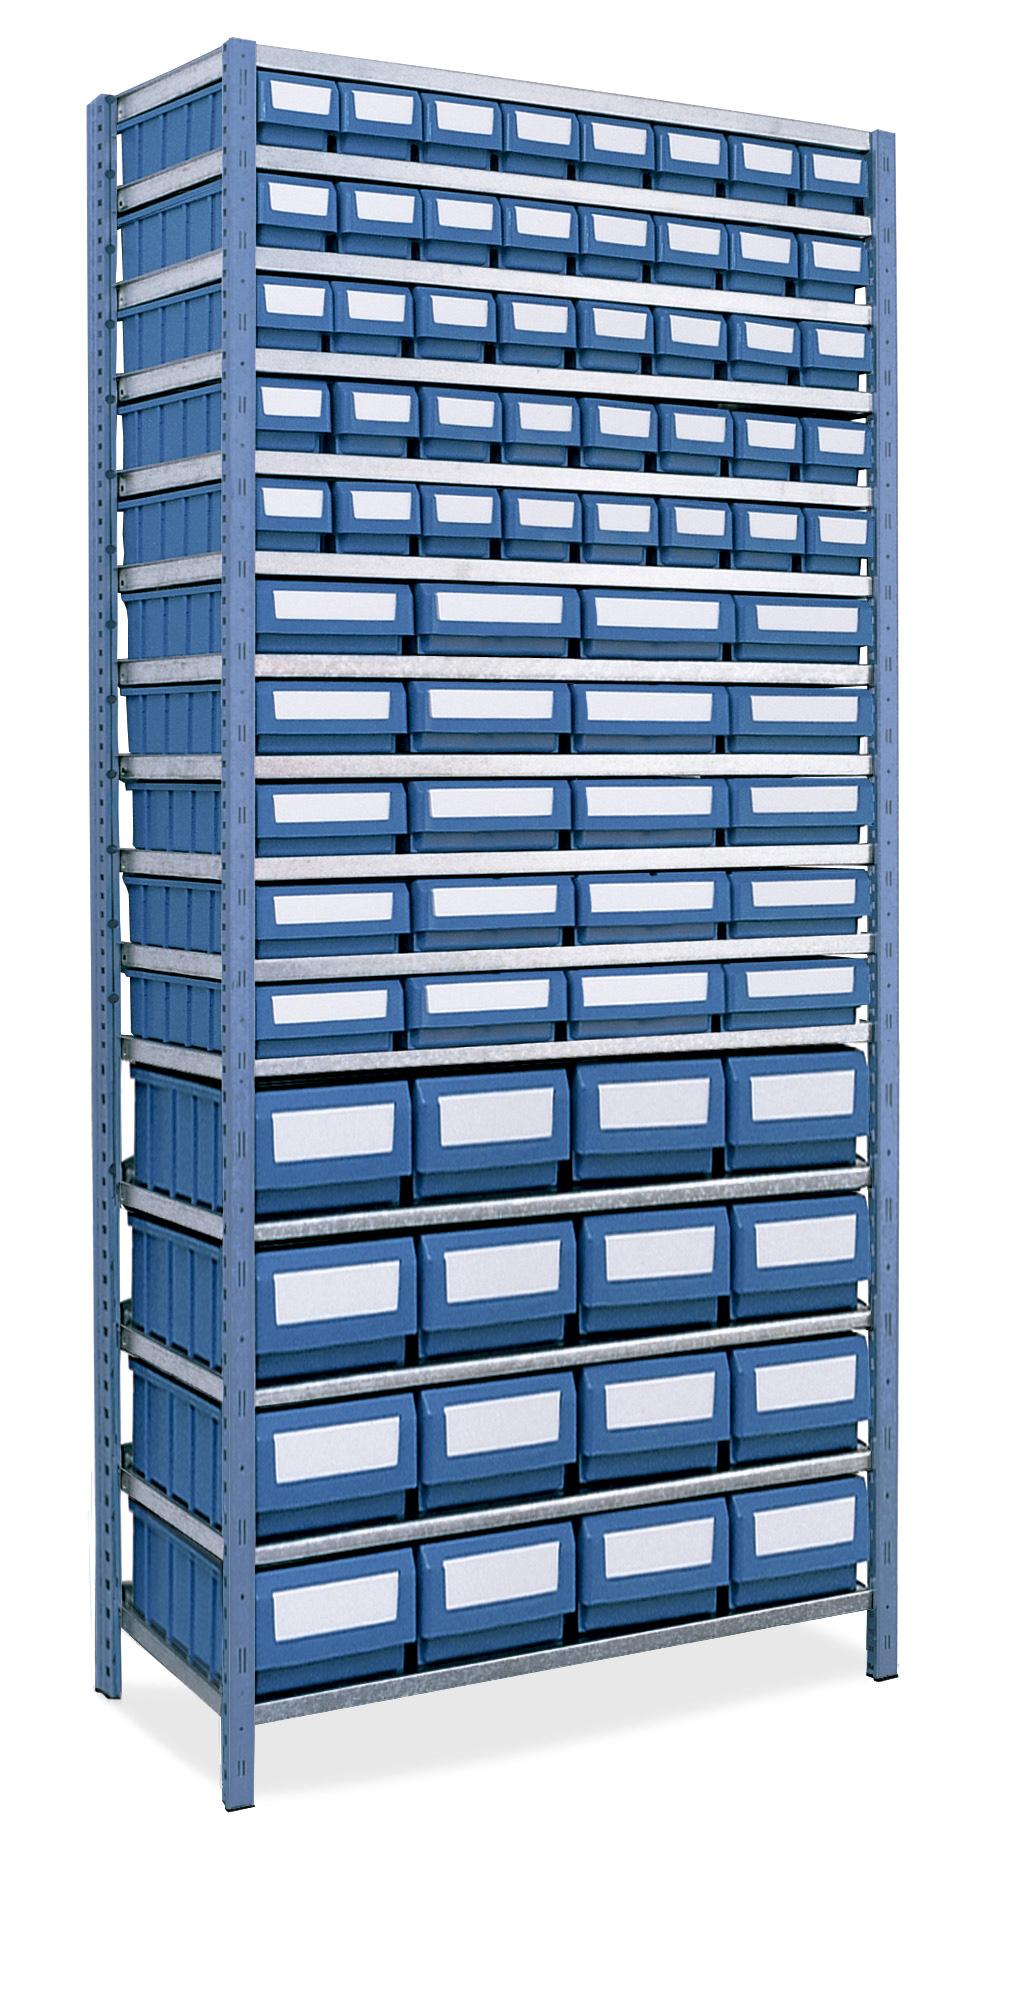 5 kit estanterias metalicas - Kit estanterías metálicas